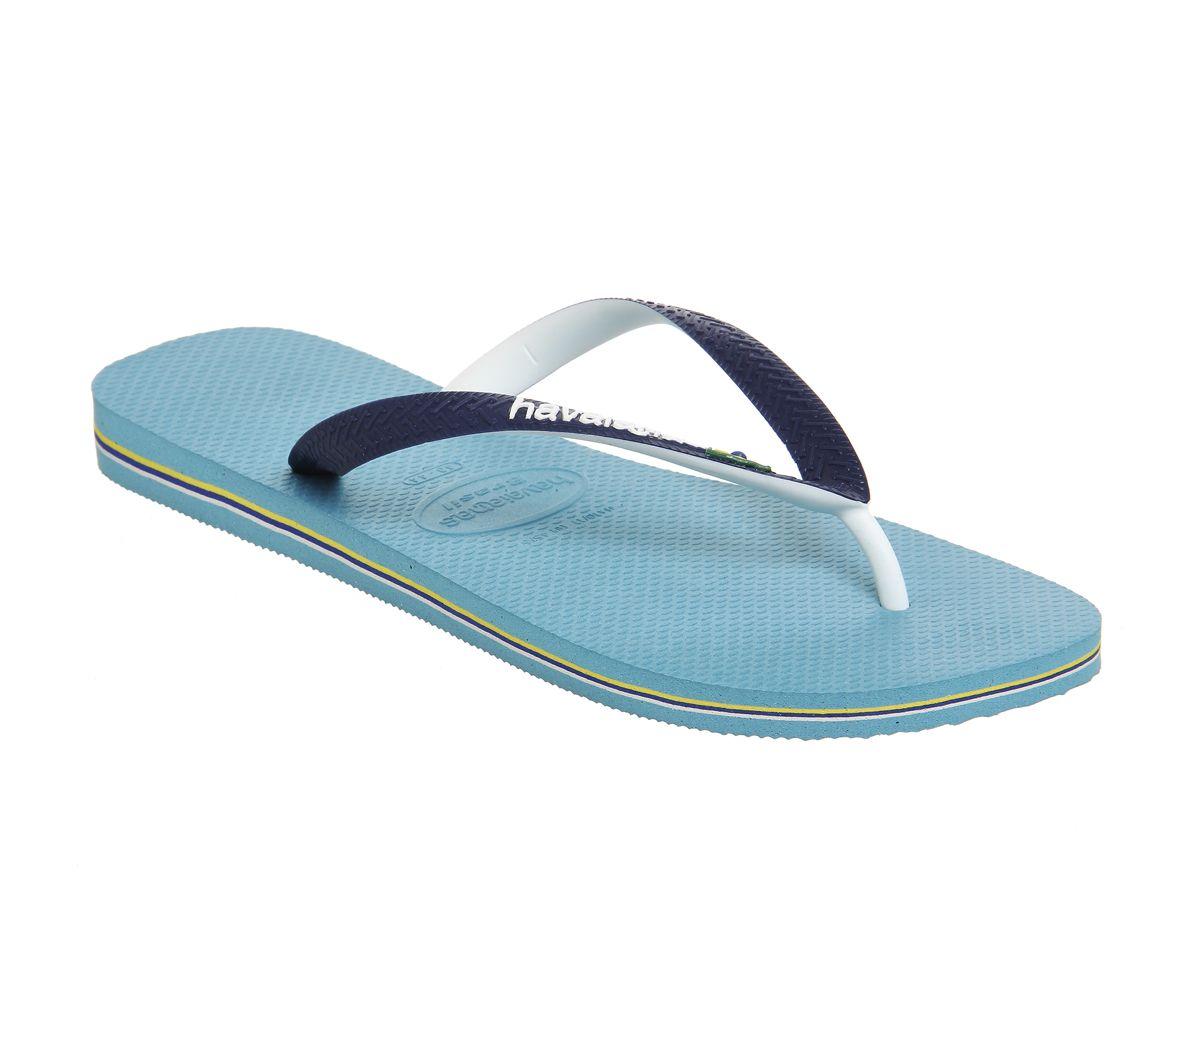 85b025945fd6 Havaianas Brasil Mix Blue - Sandals